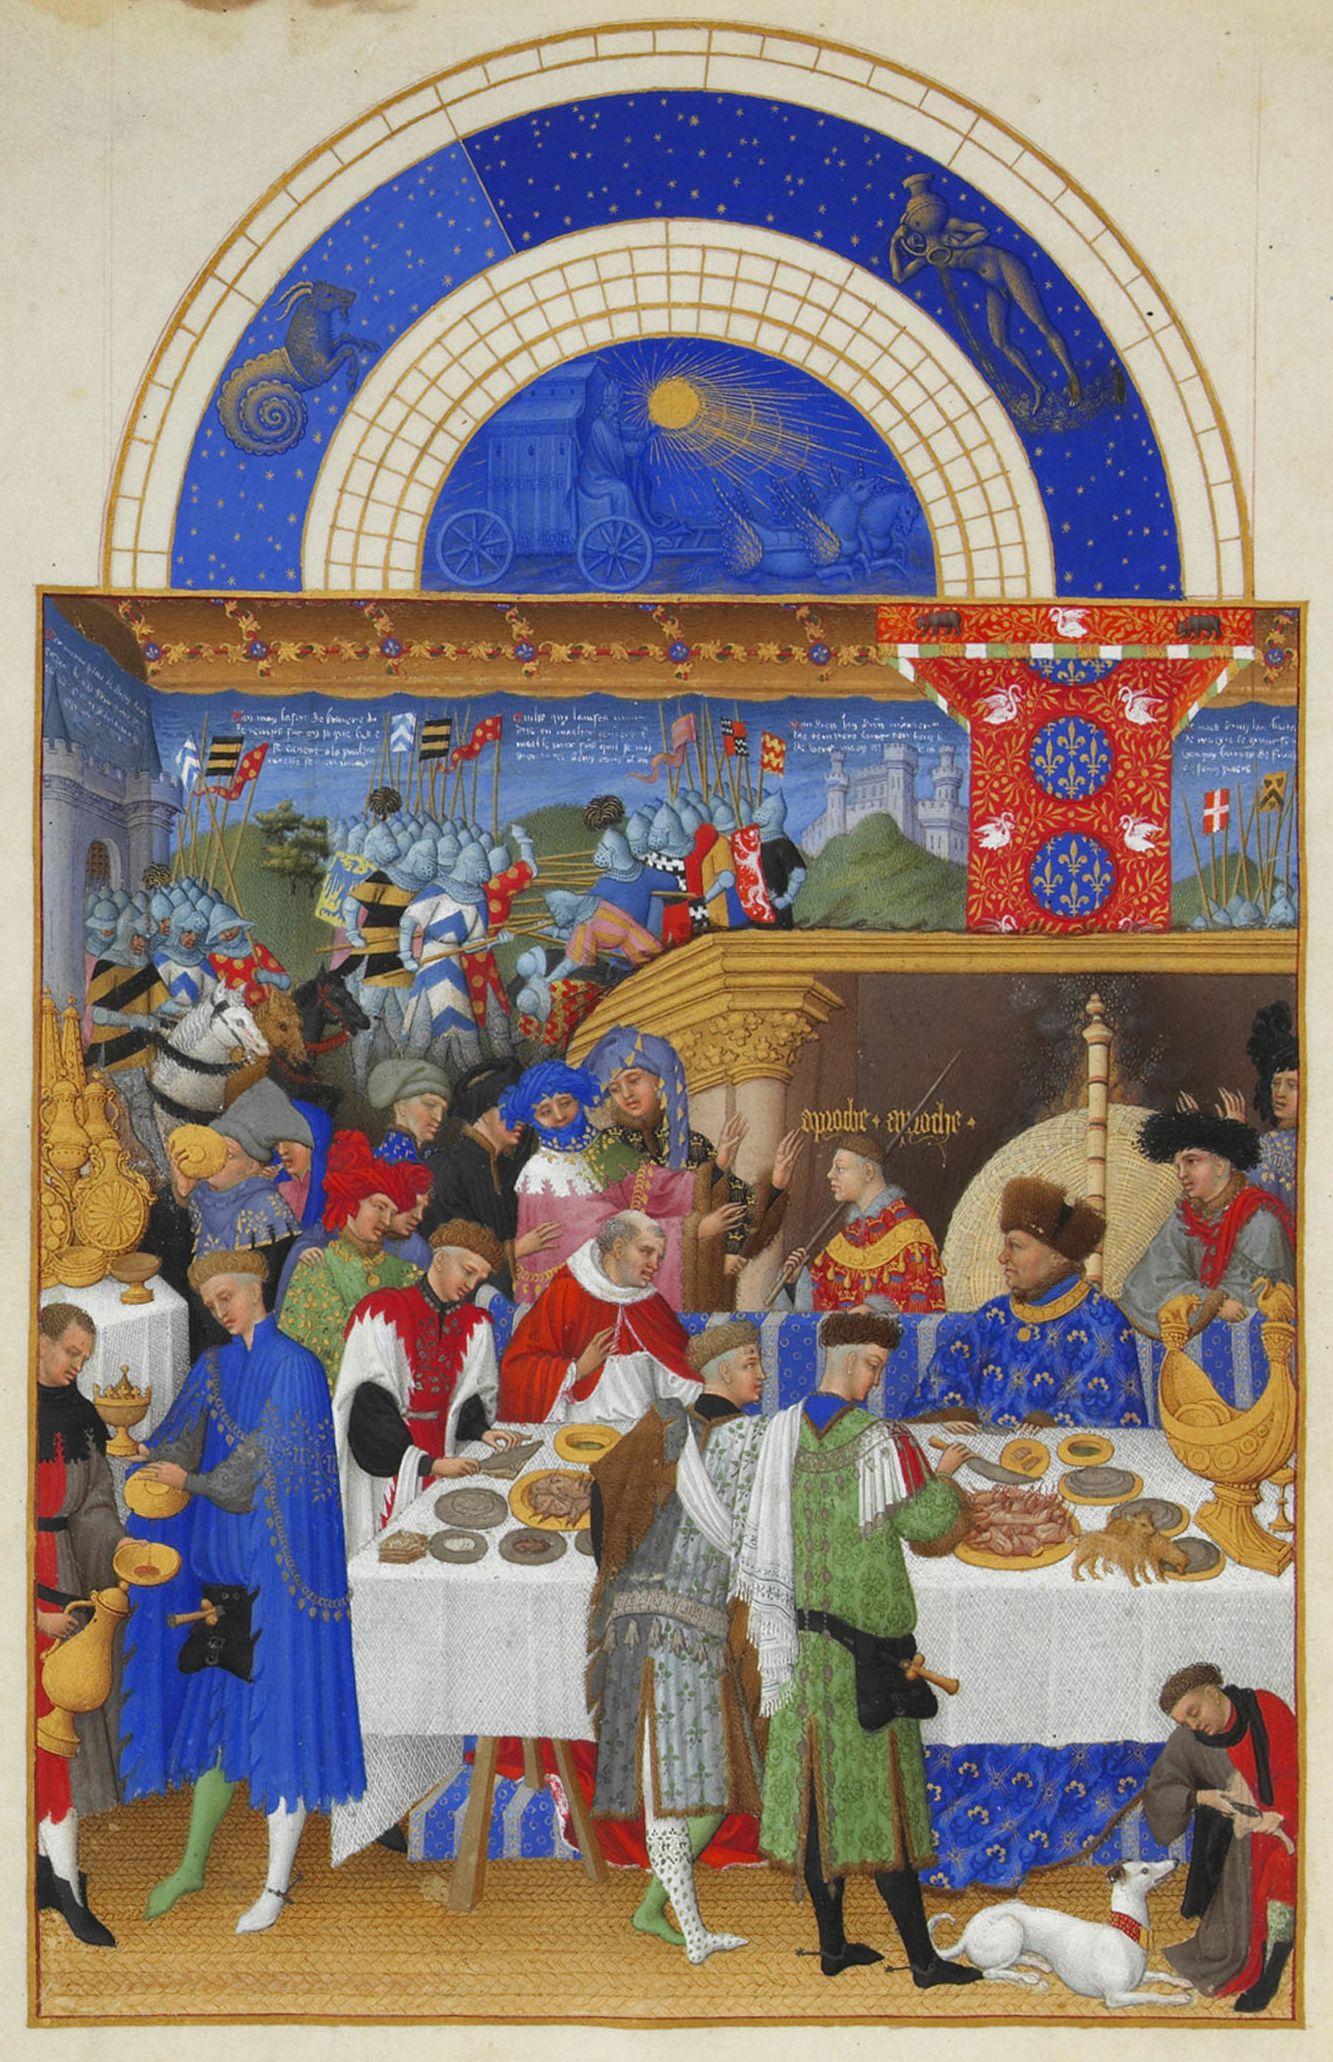 http://upload.wikimedia.org/wikipedia/commons/8/8a/Les_Très_Riches_Heures_du_duc_de_Berry_Janvier.jpg